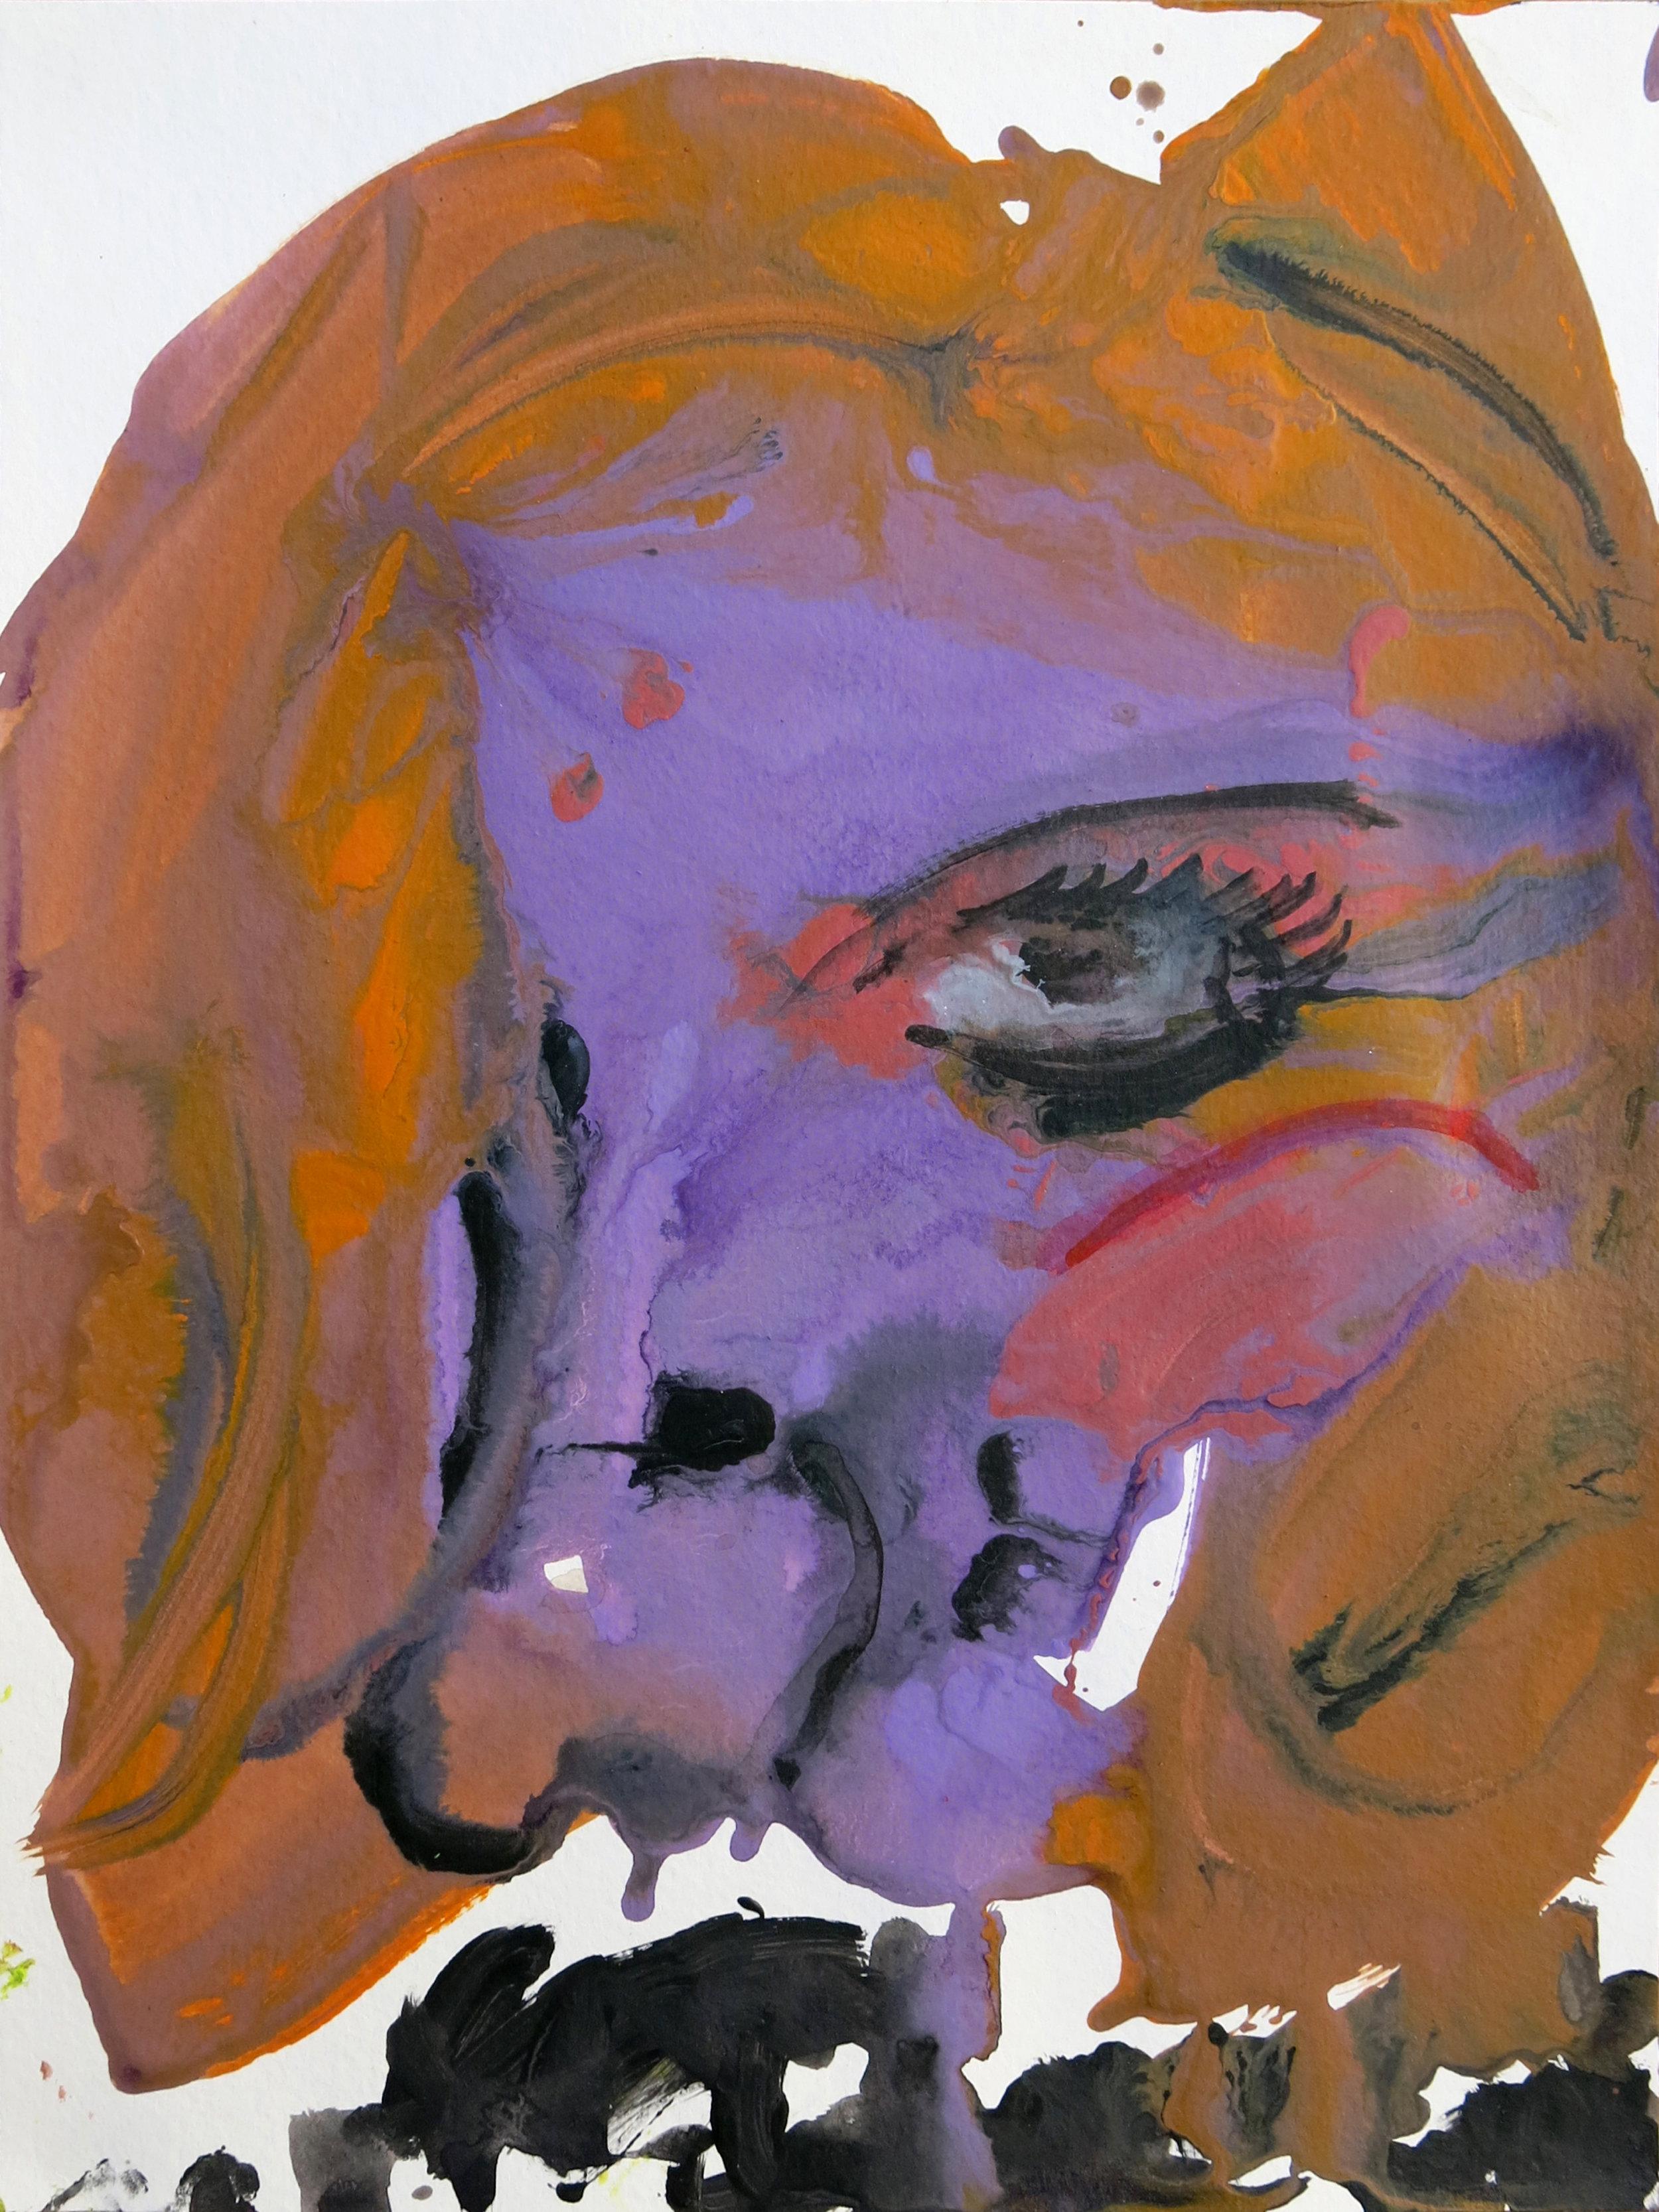 Barbra Streisand Portrait #50